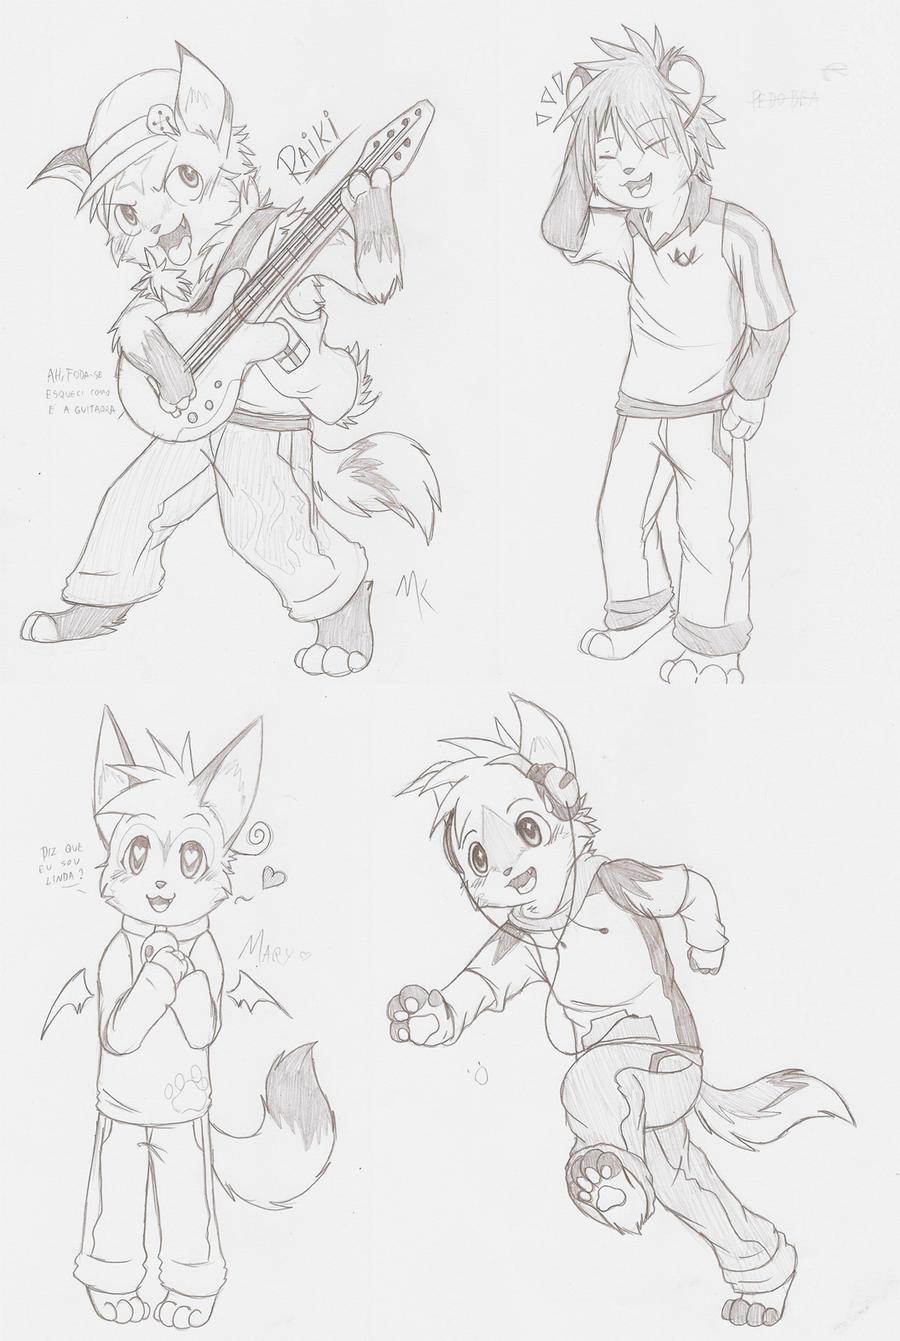 Chibi Anthro Sketchies by ThatWildMary